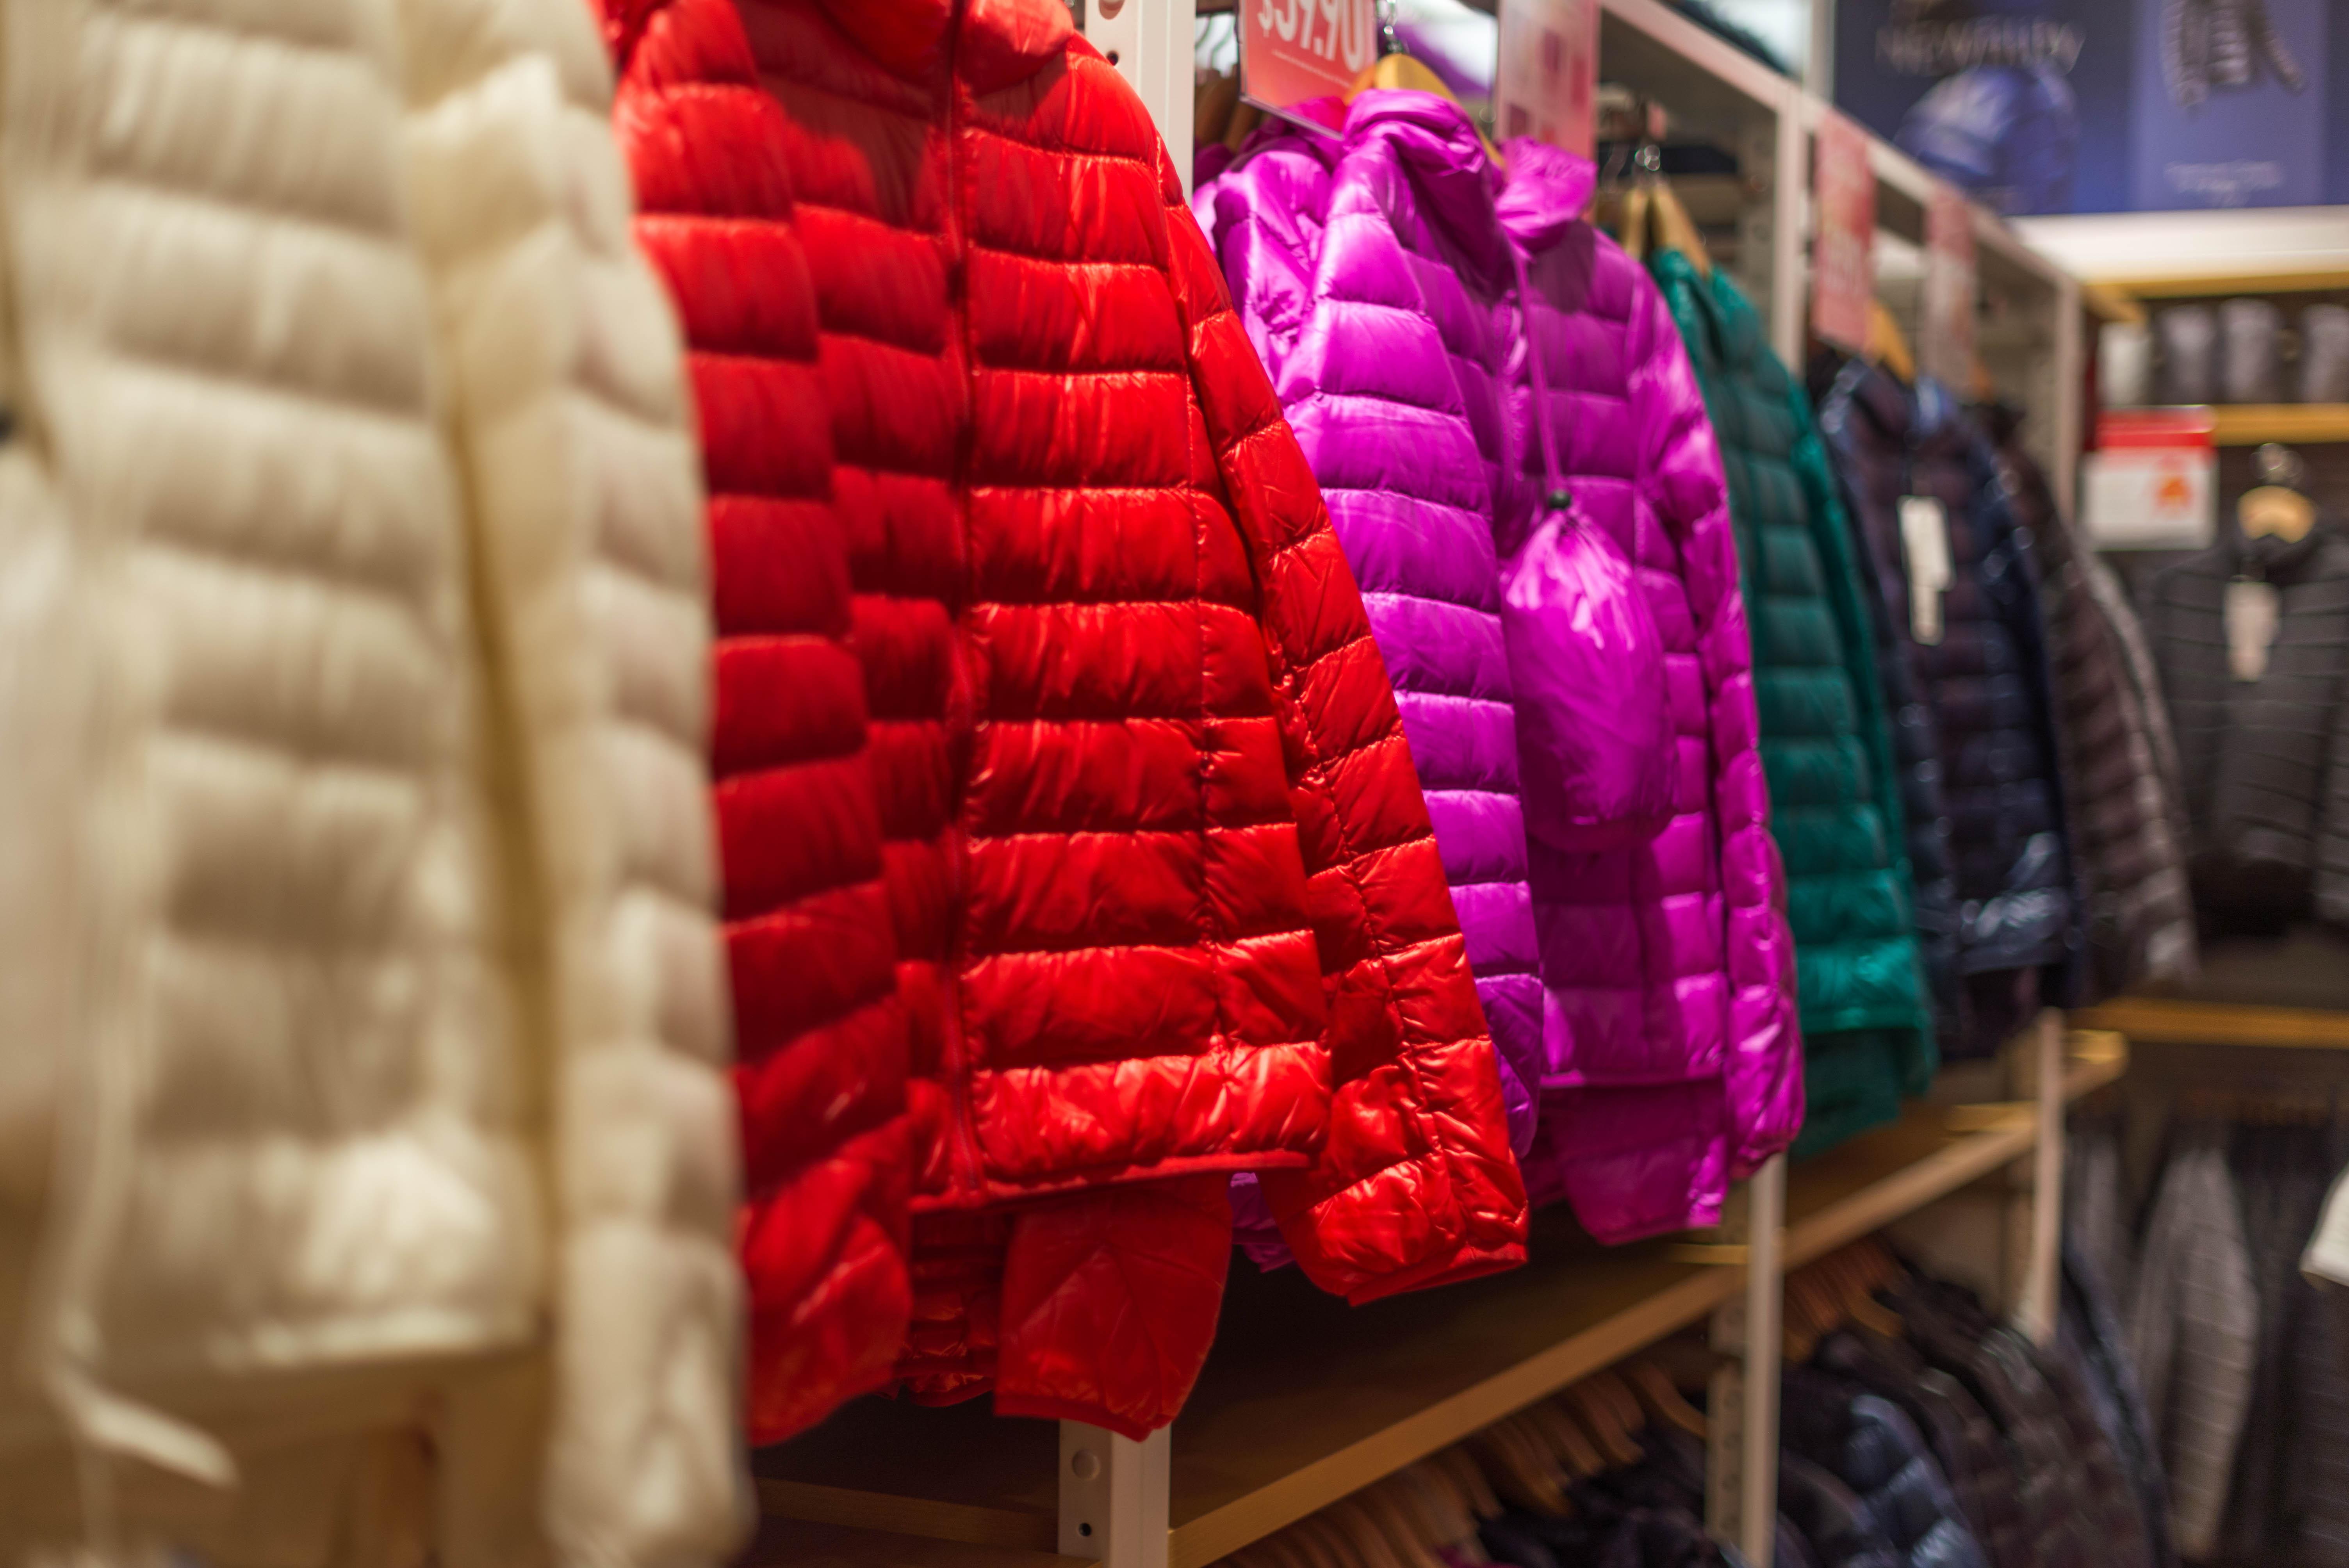 jackets-coats-shop-store-retail